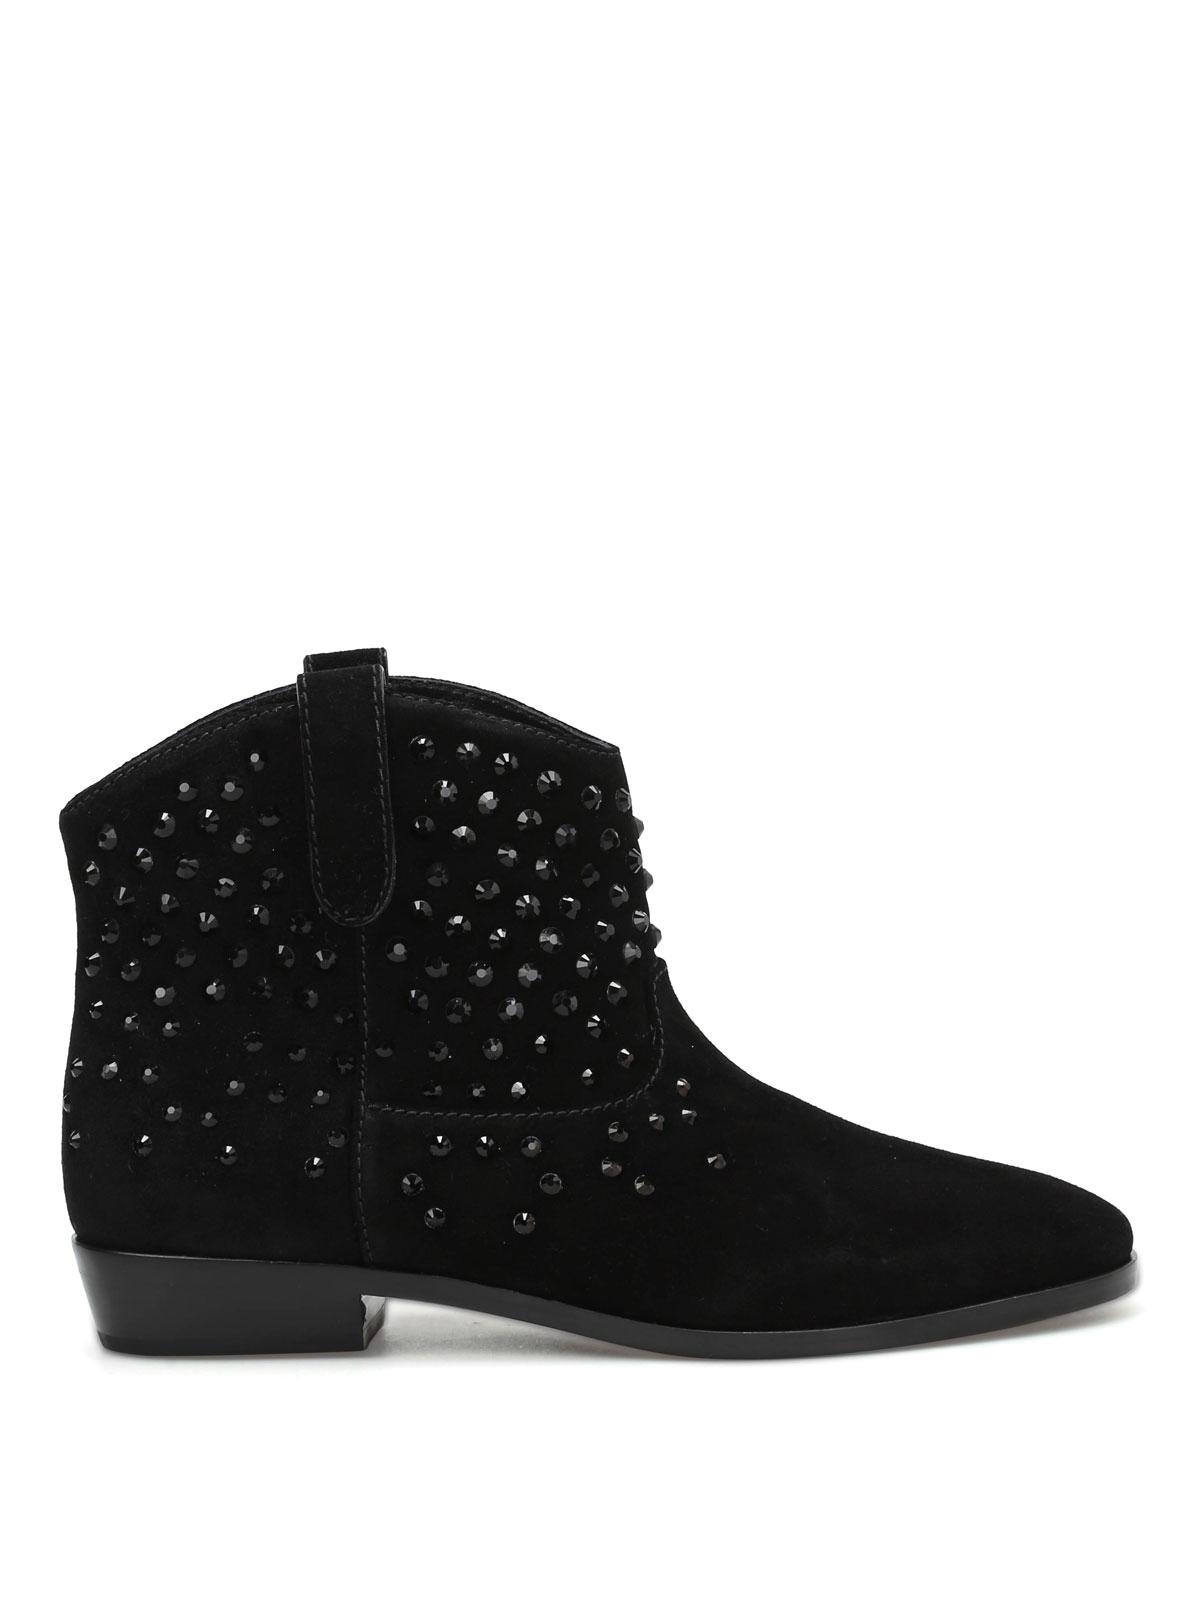 ca0d81c3d827 Michael Kors - Dani embellished suede booties - ankle .